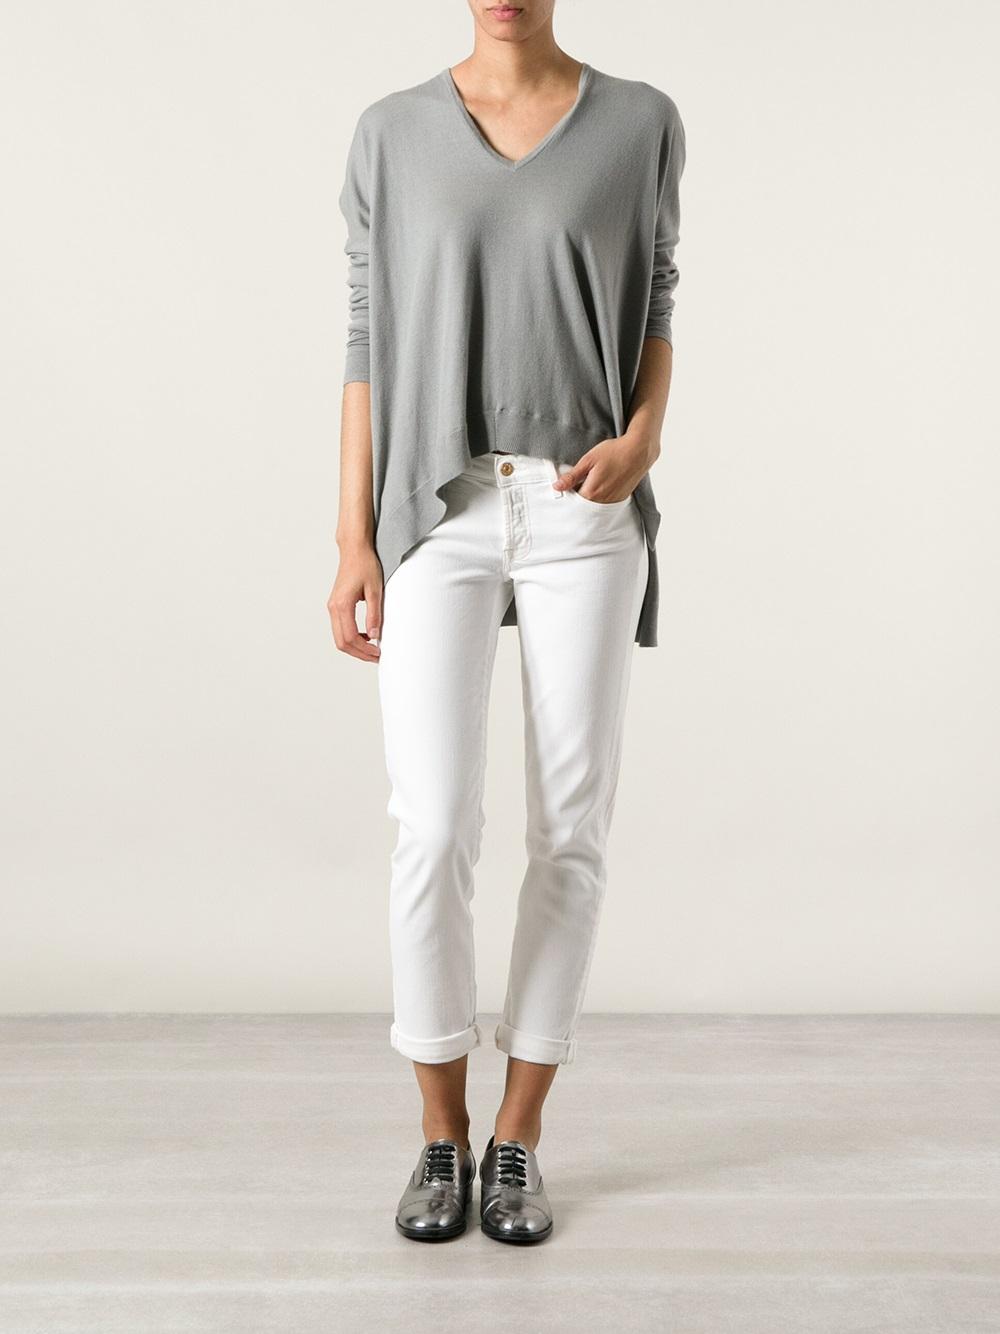 7 for all mankind Josefina Boyfriend Jeans in White | Lyst